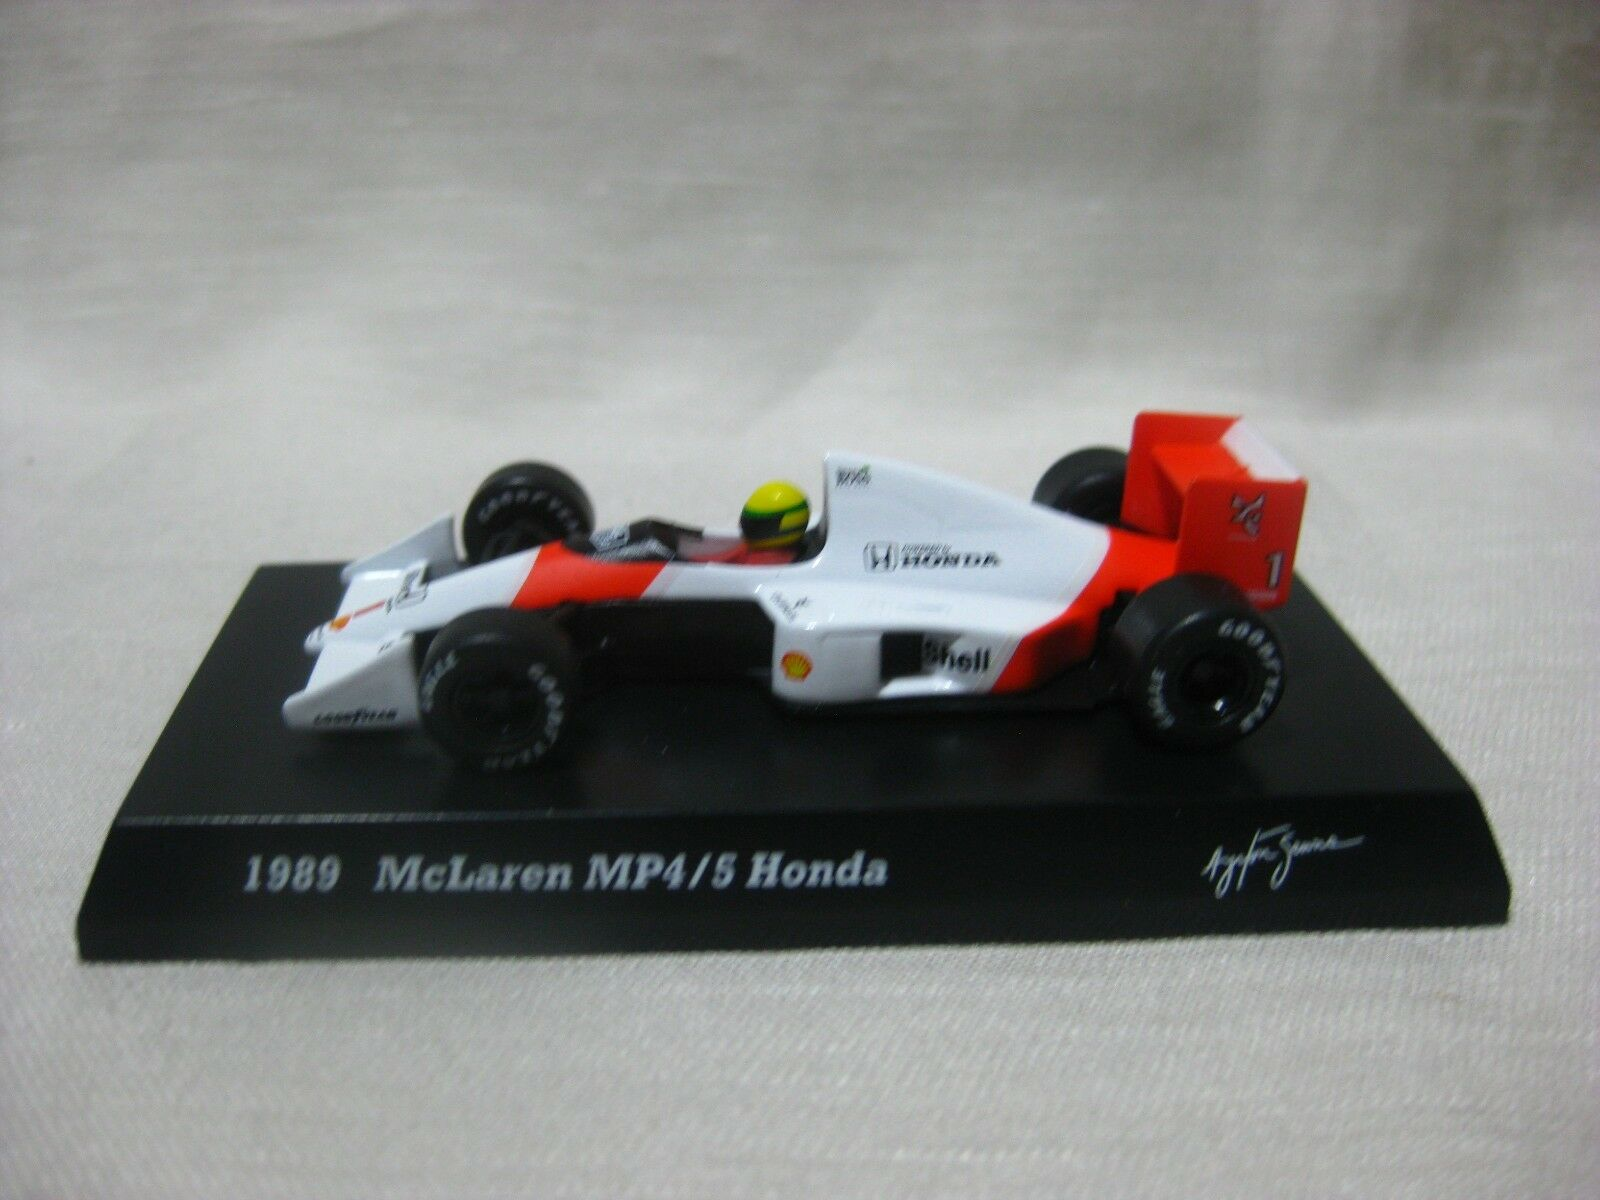 1 64 Kyosho McLaren MP4  5 1989 Honda tärningskast modelllllerler Bil